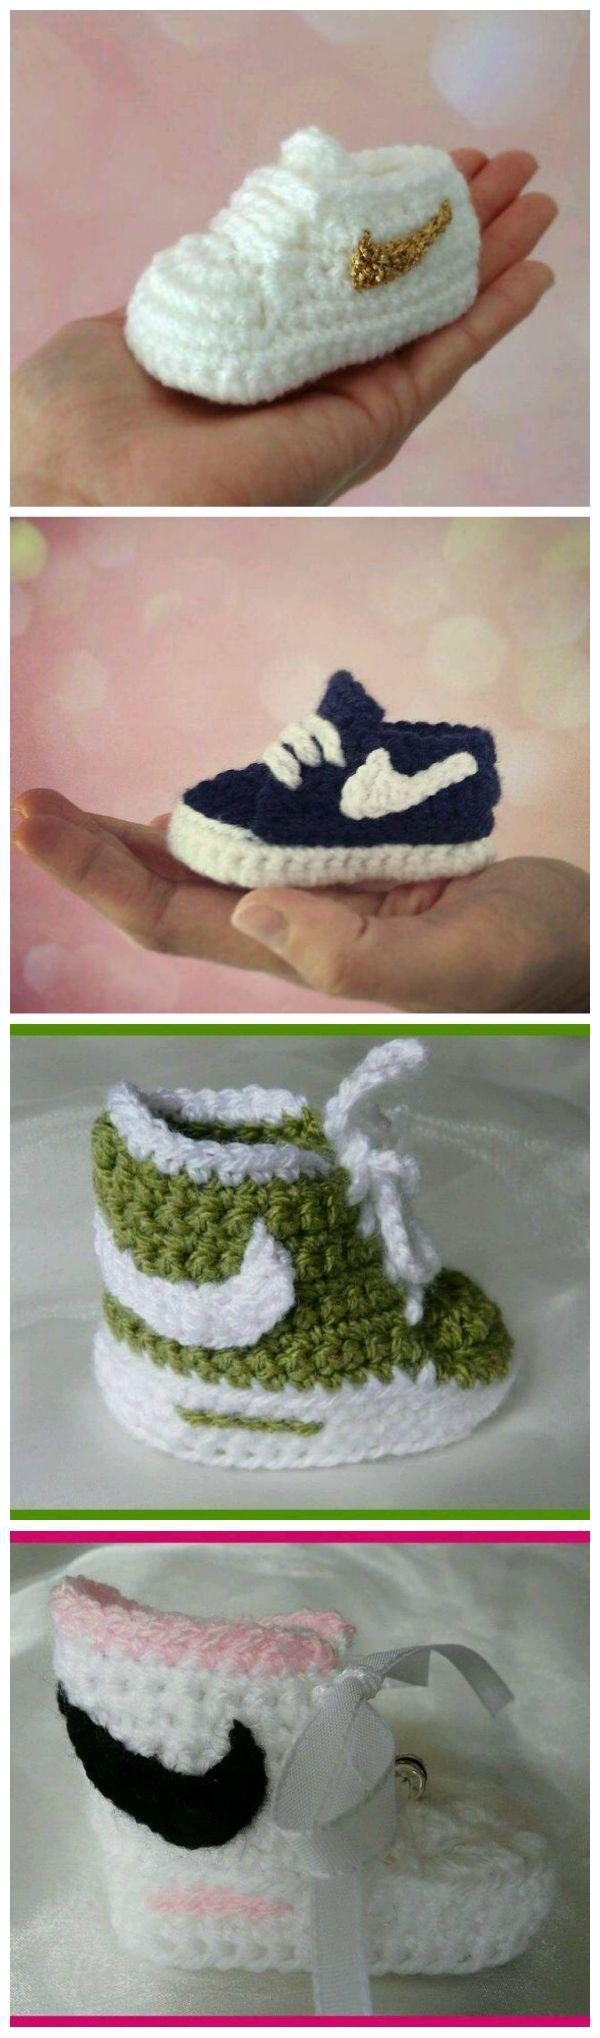 How to Crochet Nike Inspired Baby Booties | Häkelmuster und ...